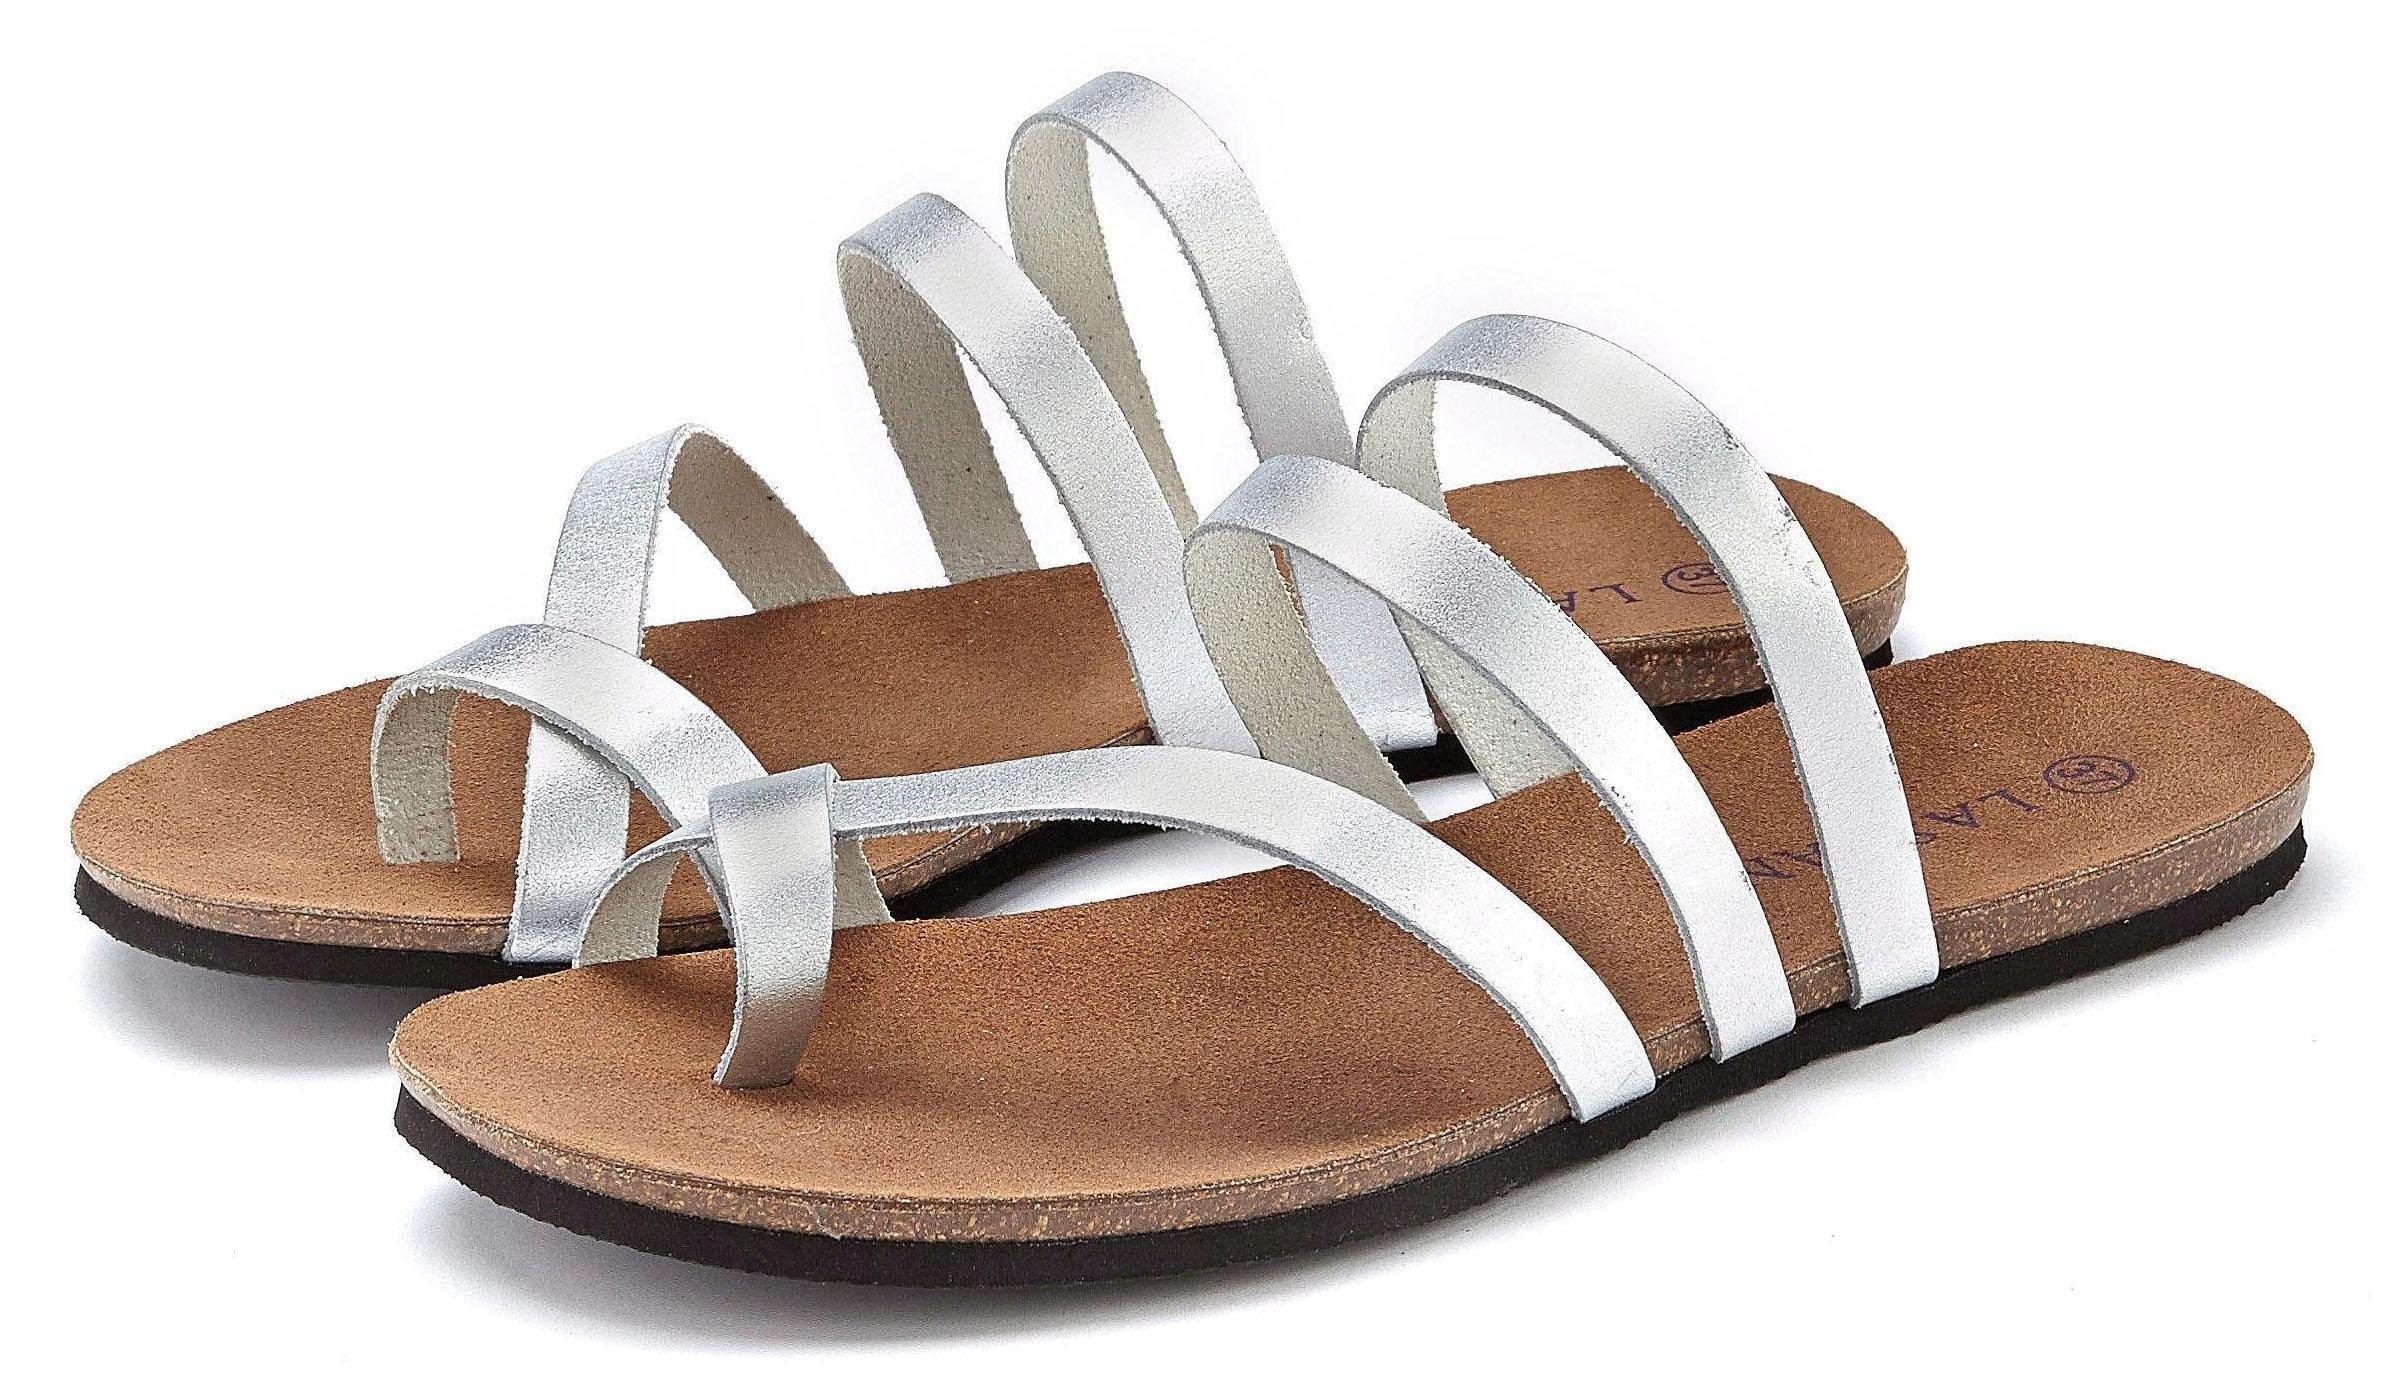 LASCANA slippers in de webshop van Lascana kopen